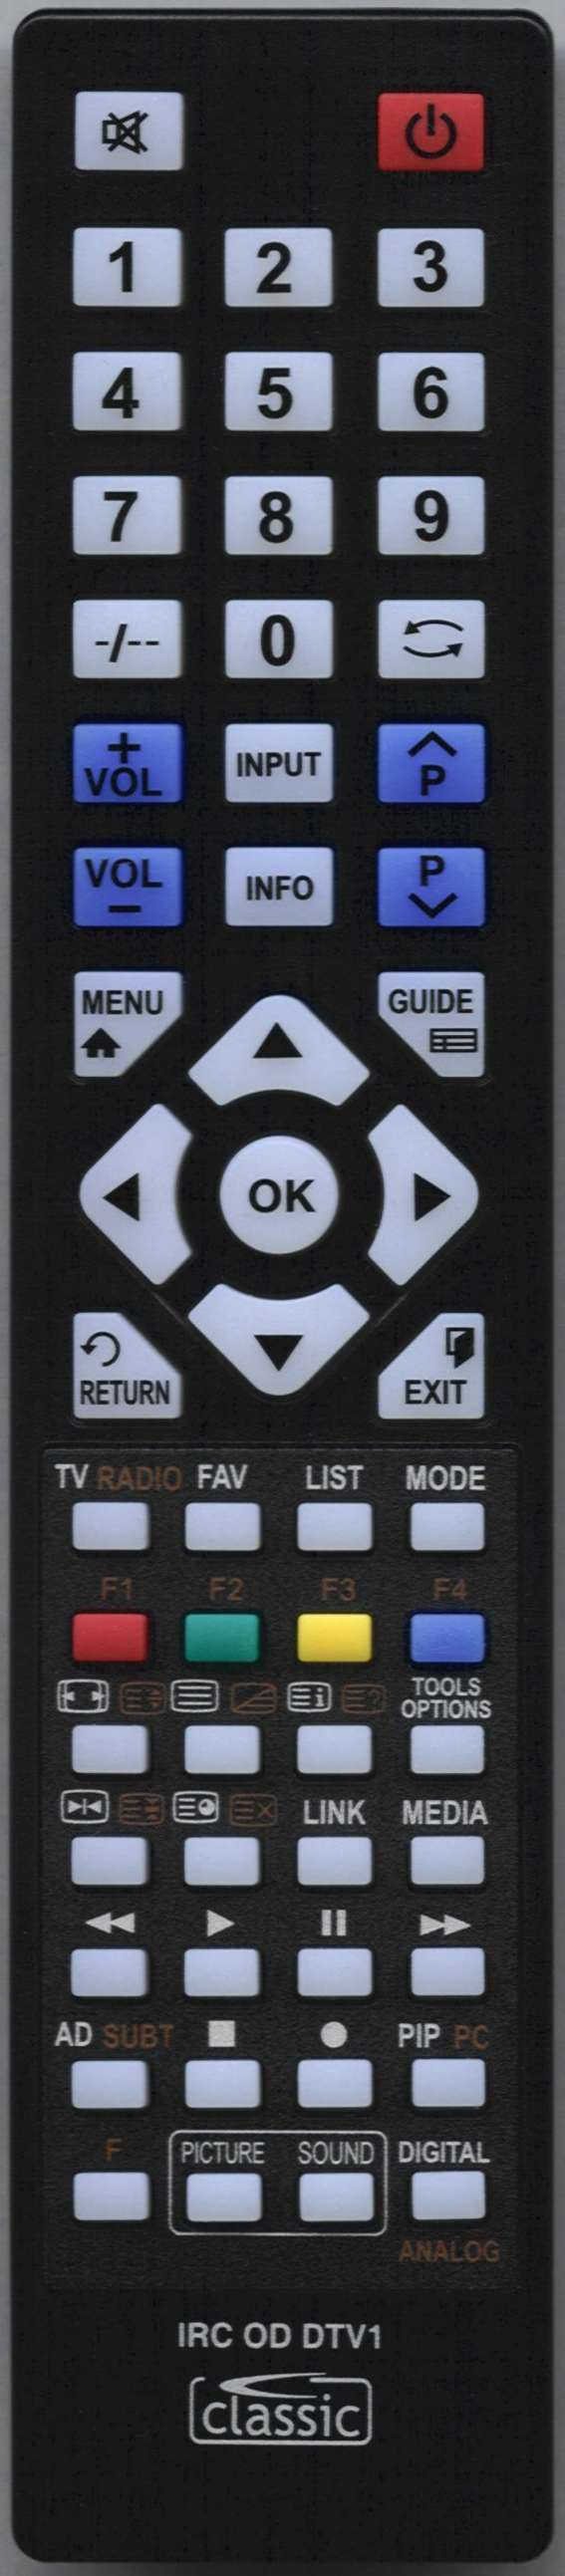 BLAUPUNKT 49/138M-GB-11B4-FEGPX-UK Remote Control